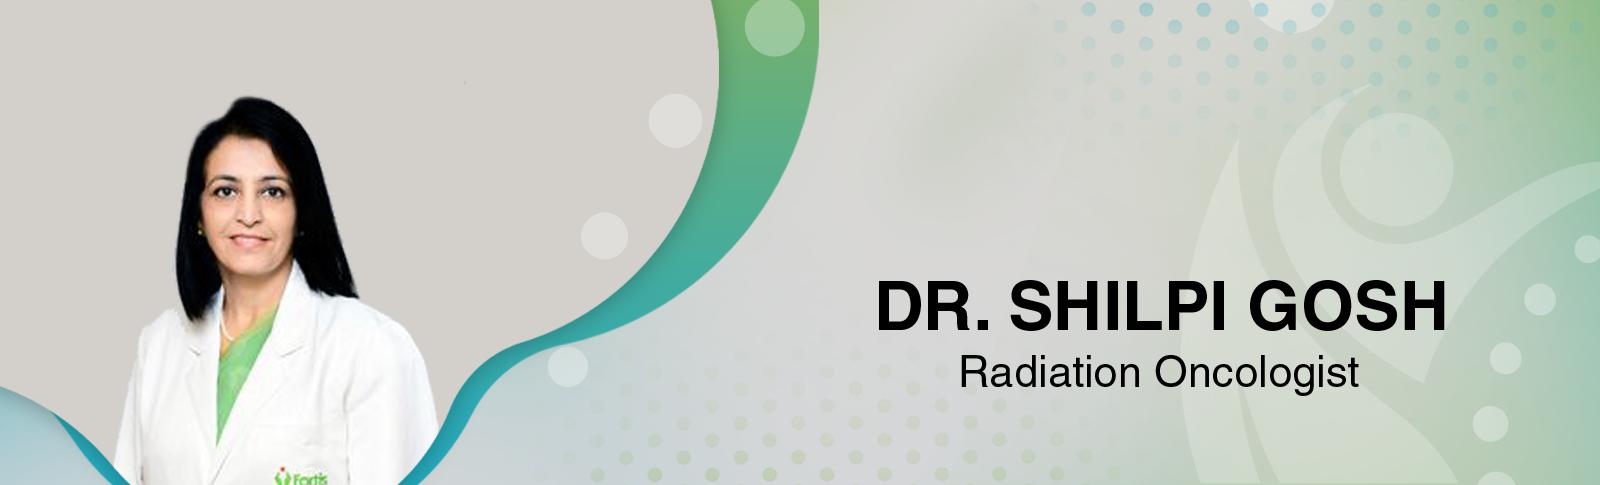 Dr. Shipli Ghosh